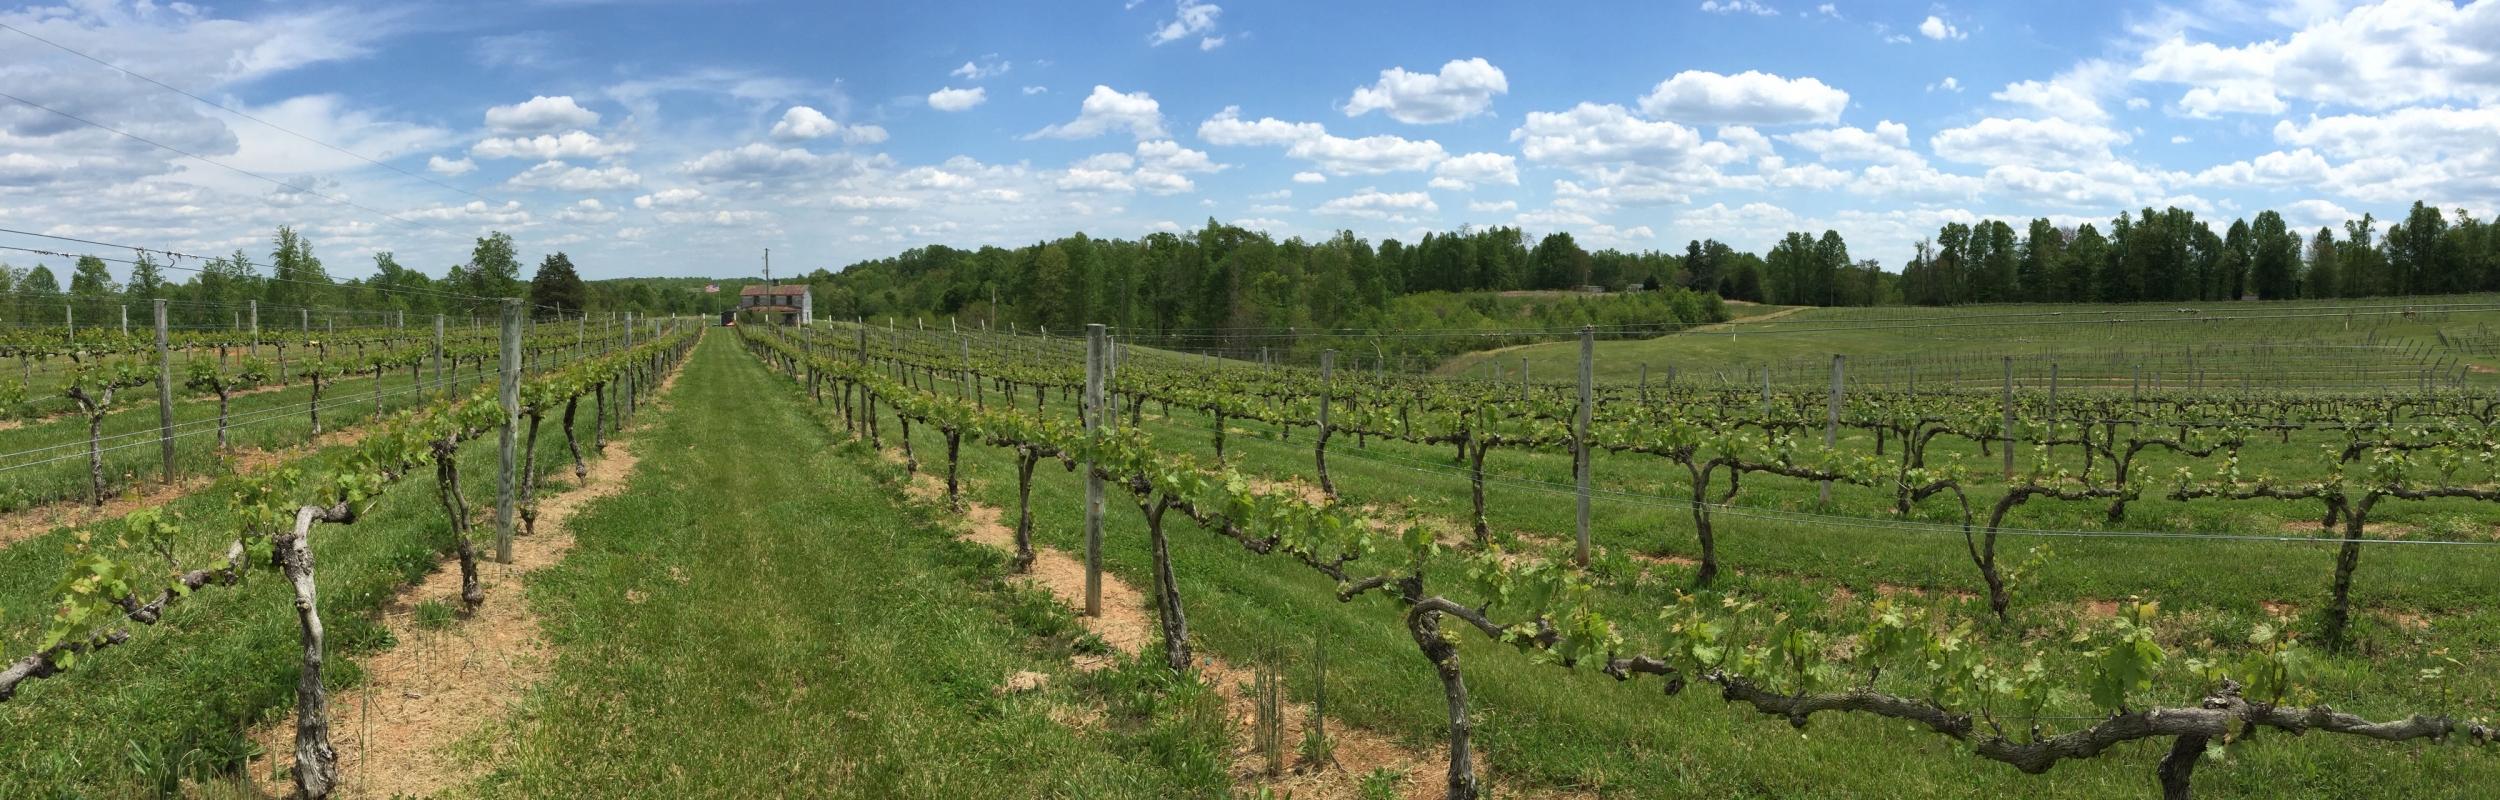 vineyard_wideangle